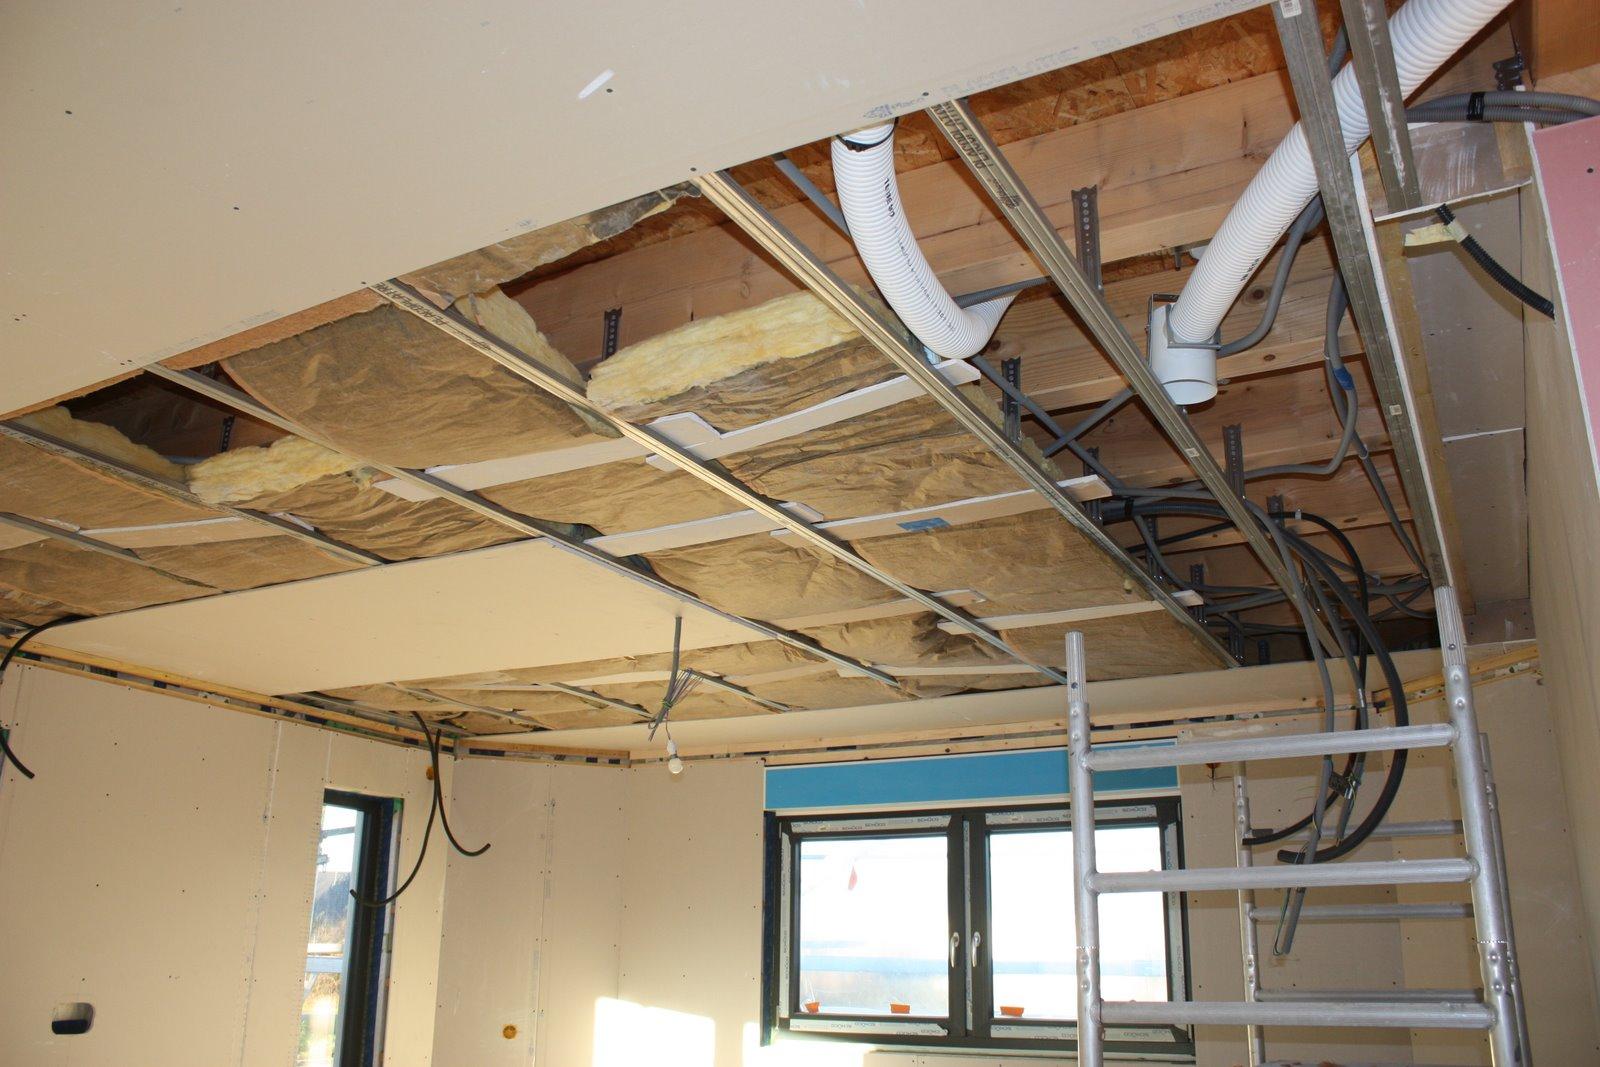 Isolant pour faux plafond isolation id es - Isolation faux plafond ...